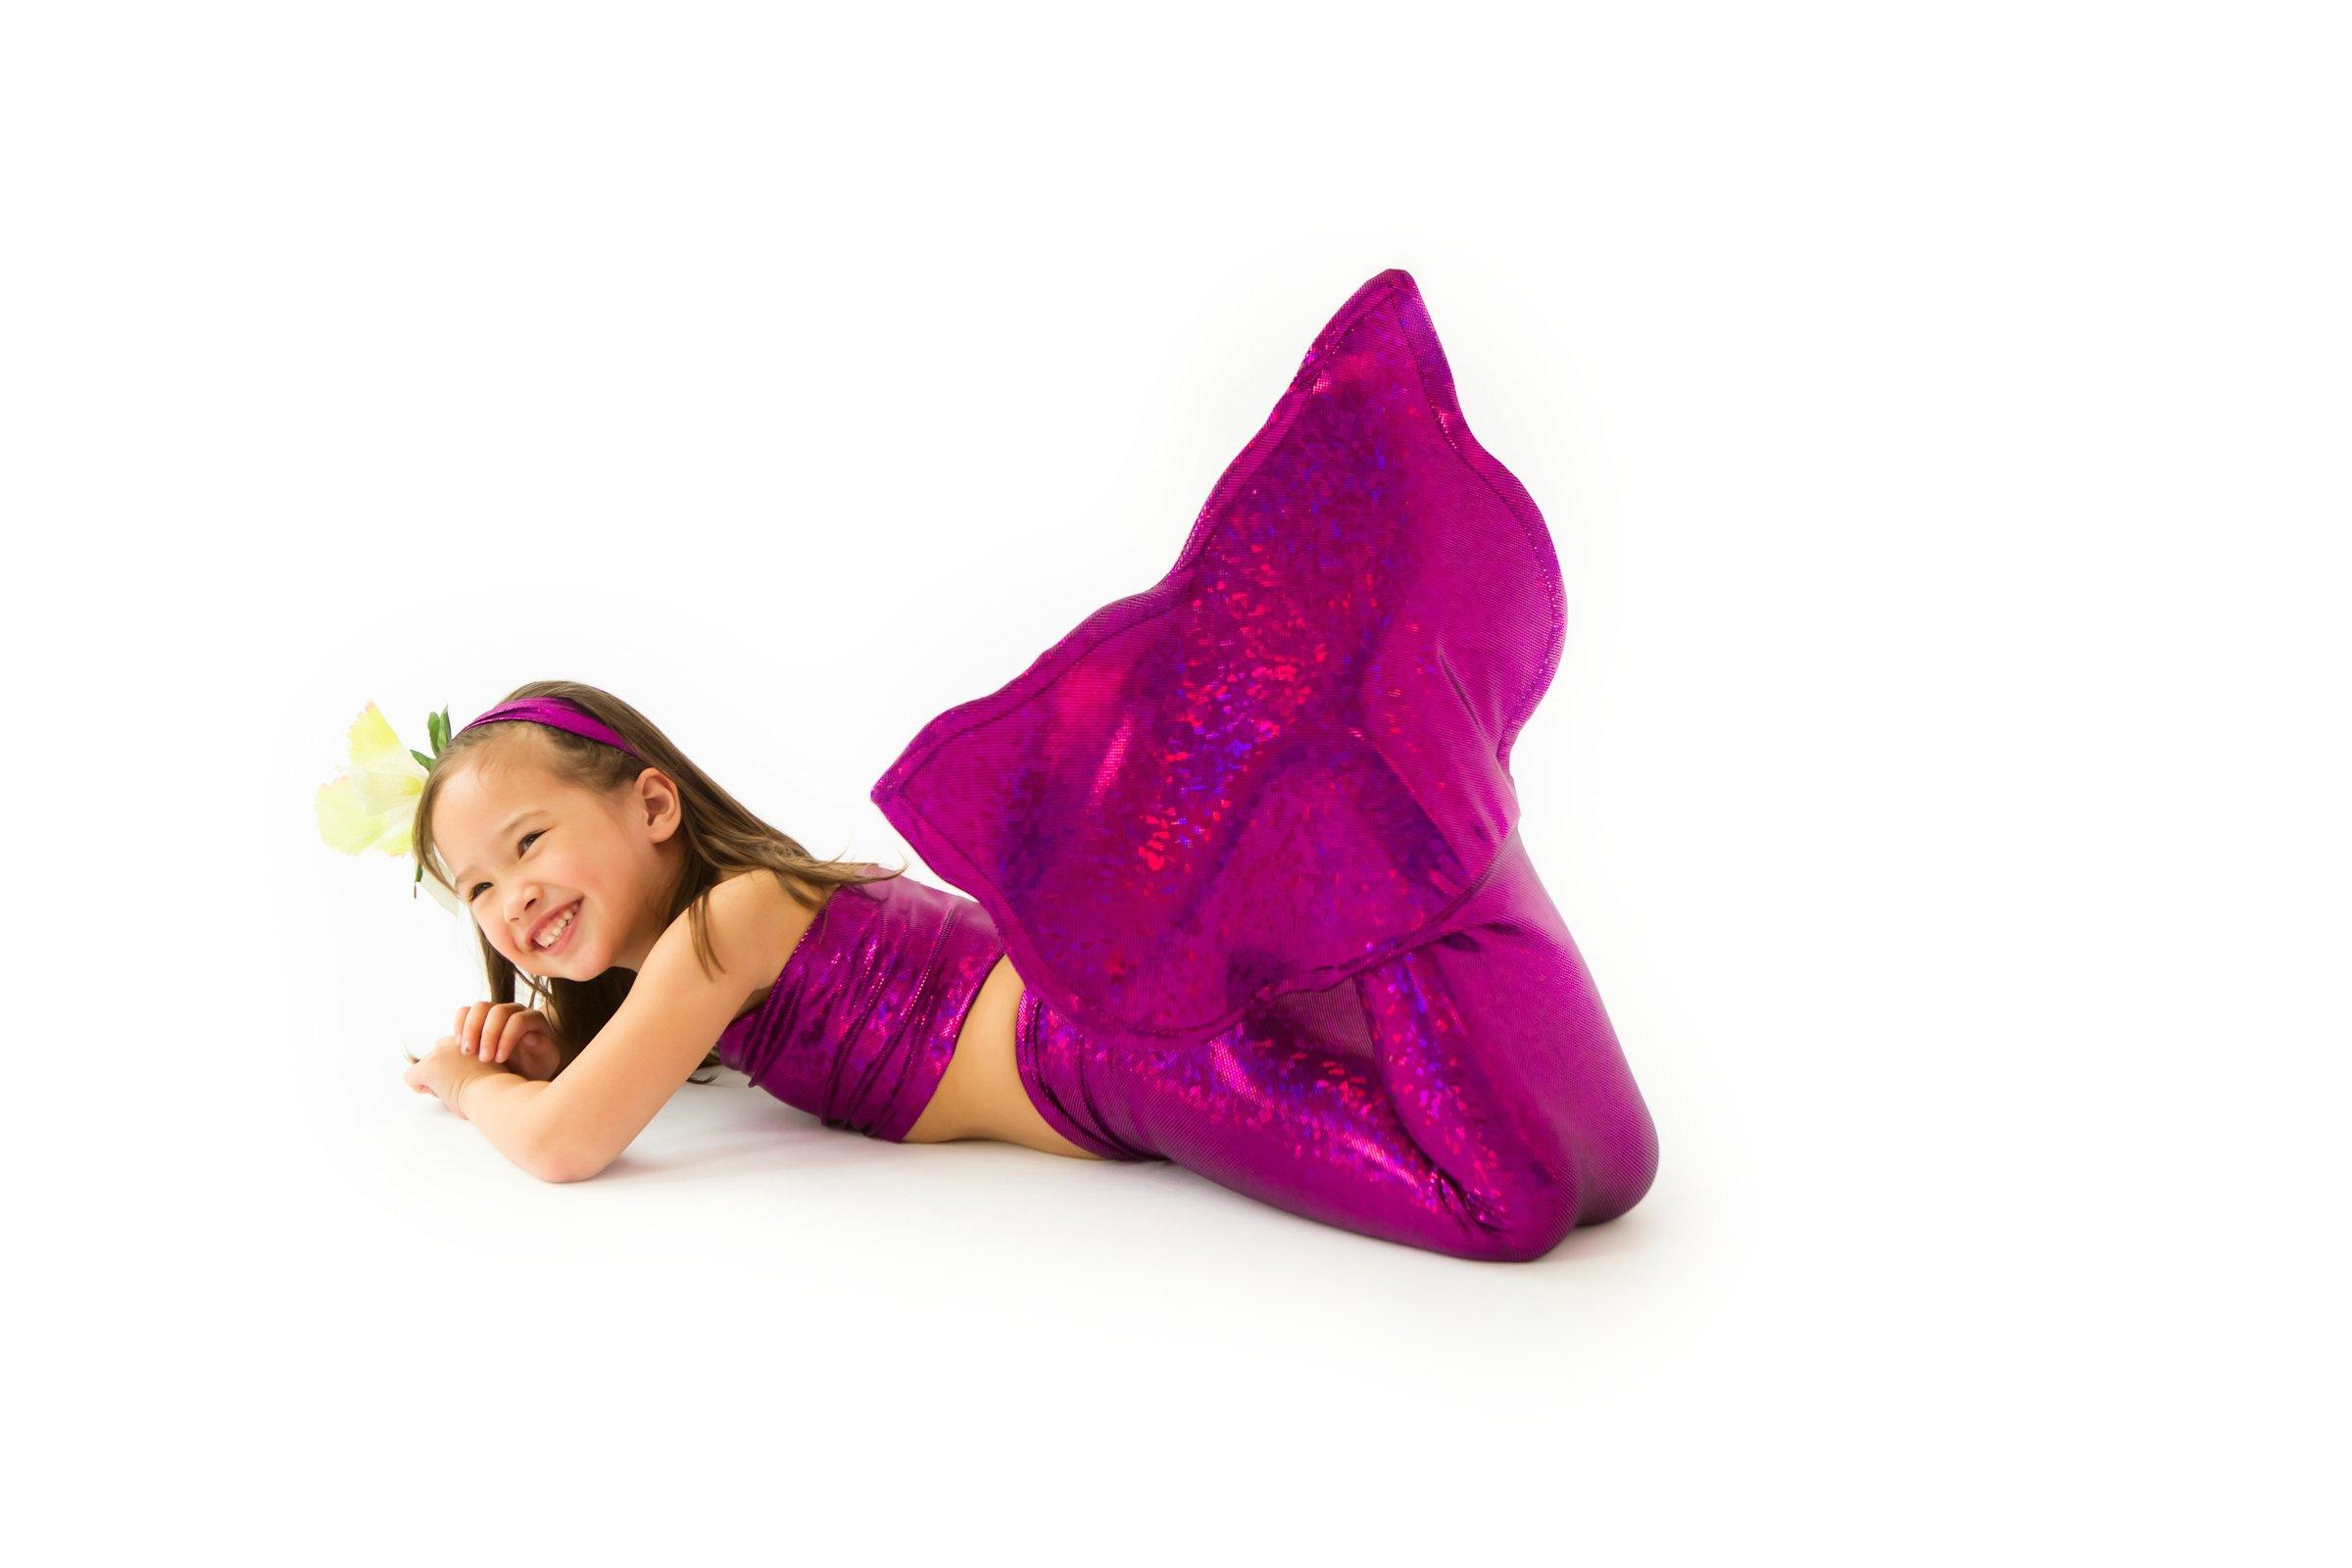 Sparkly Mermaid Tail By Applejack Apparel (Medium 5-7, Prettiest Pink)